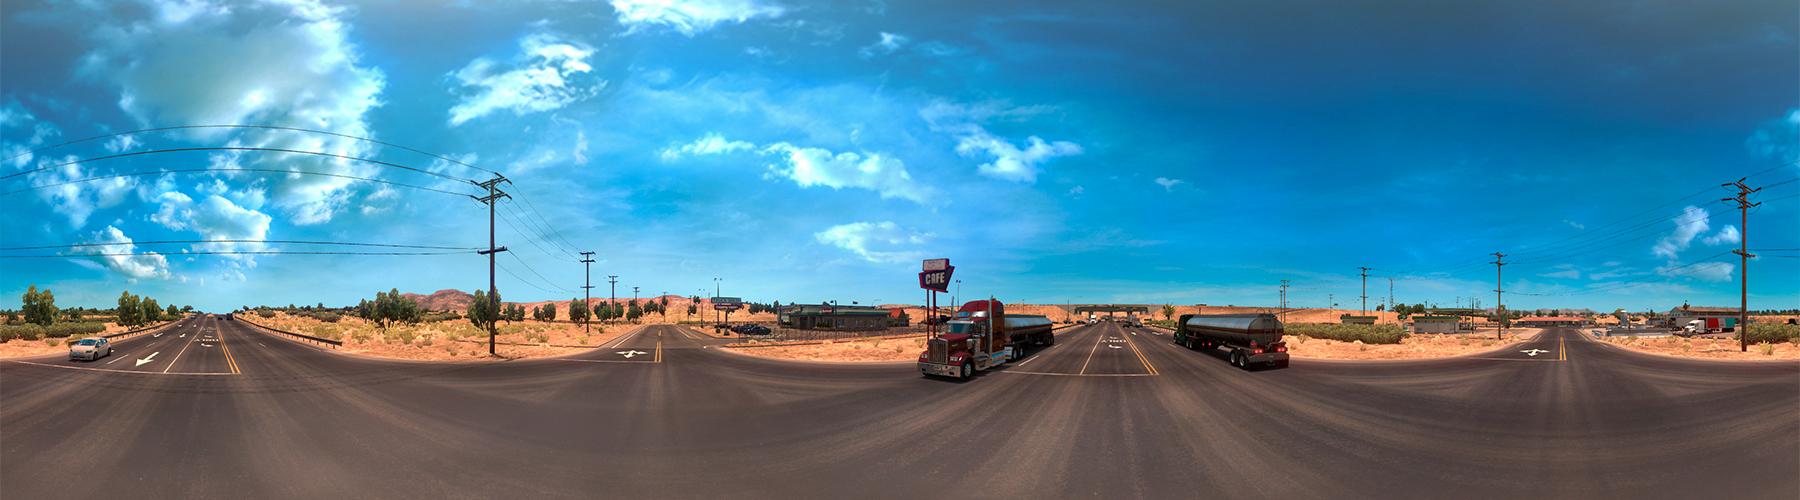 Arizona rozšířila mapu American Truck Simulatoru 124950